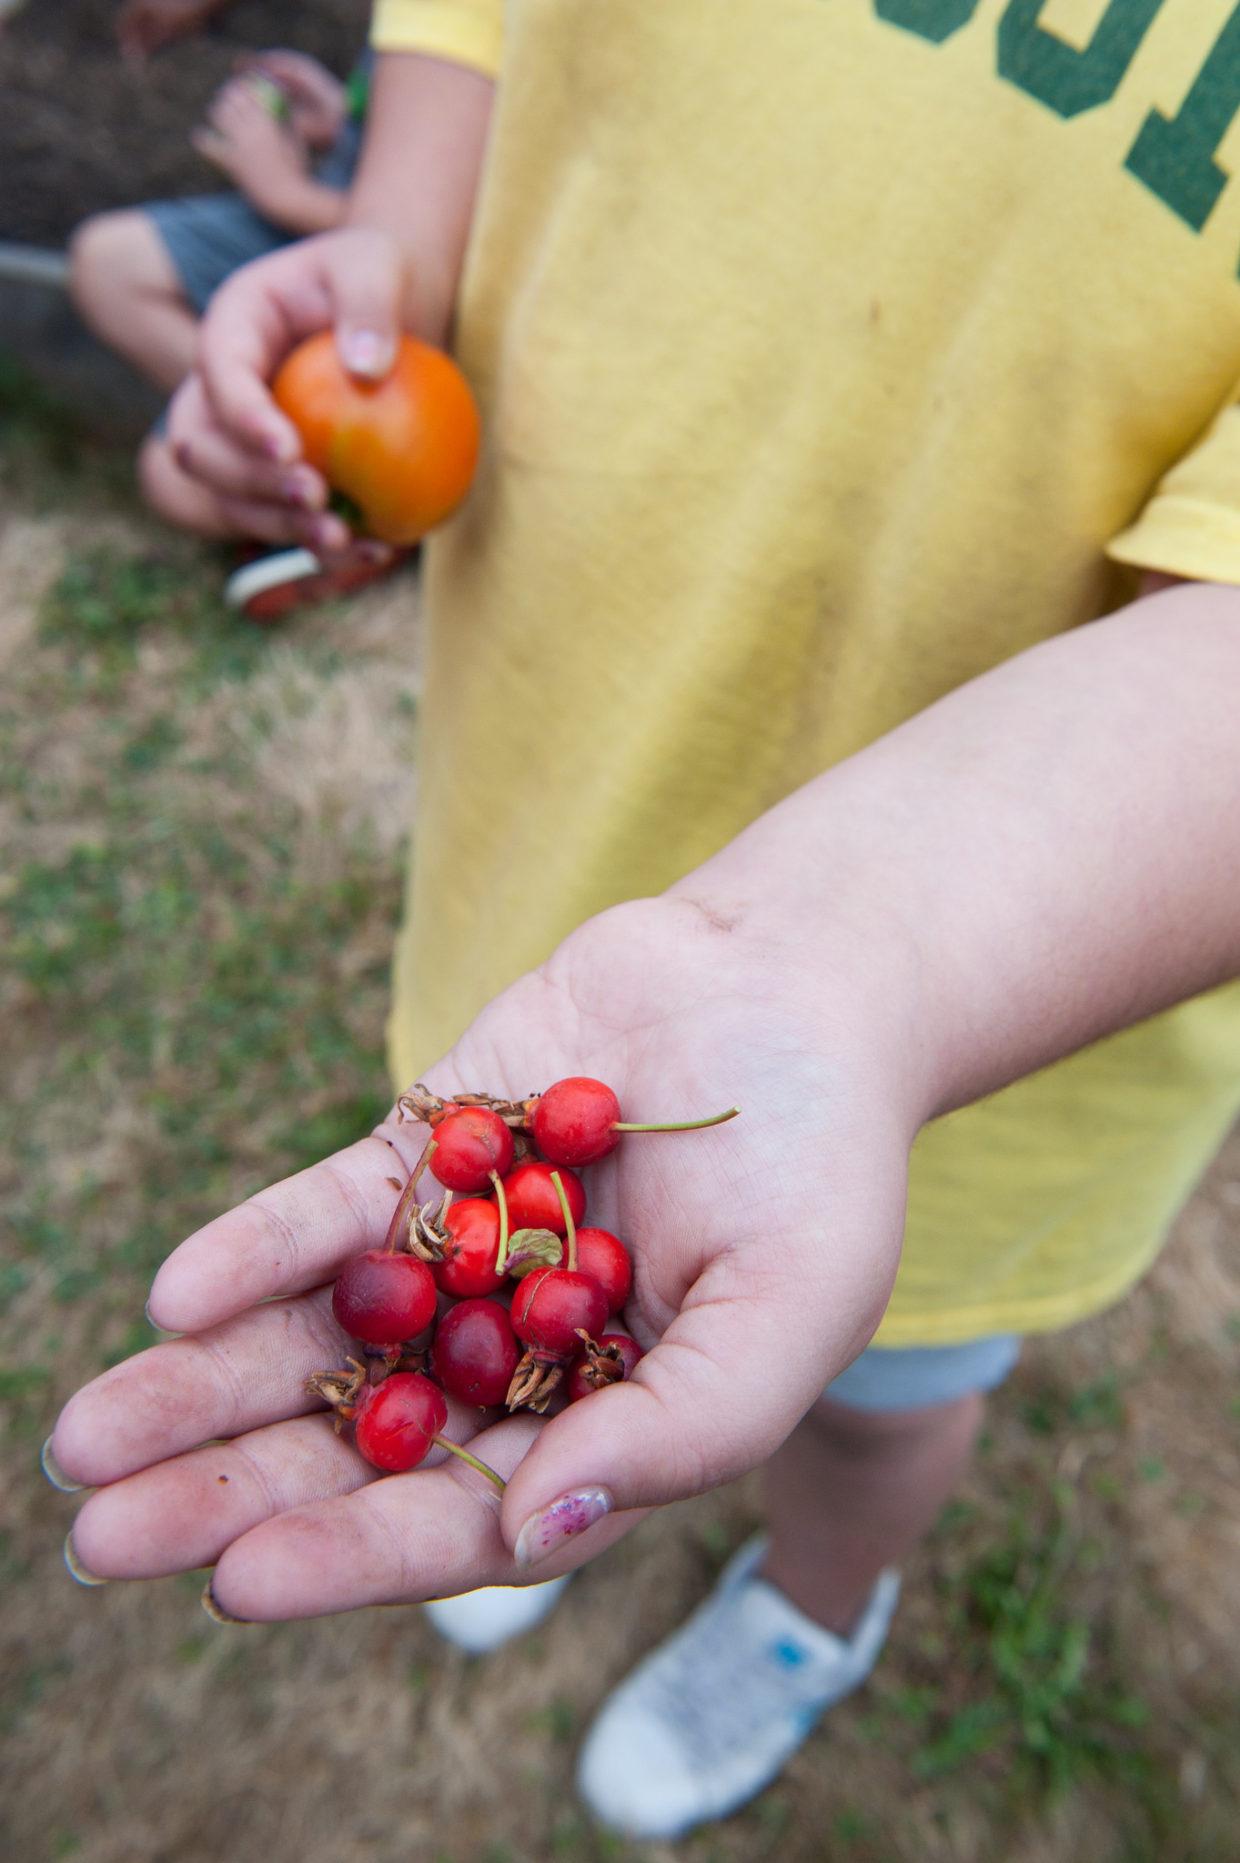 Kids dig gardening